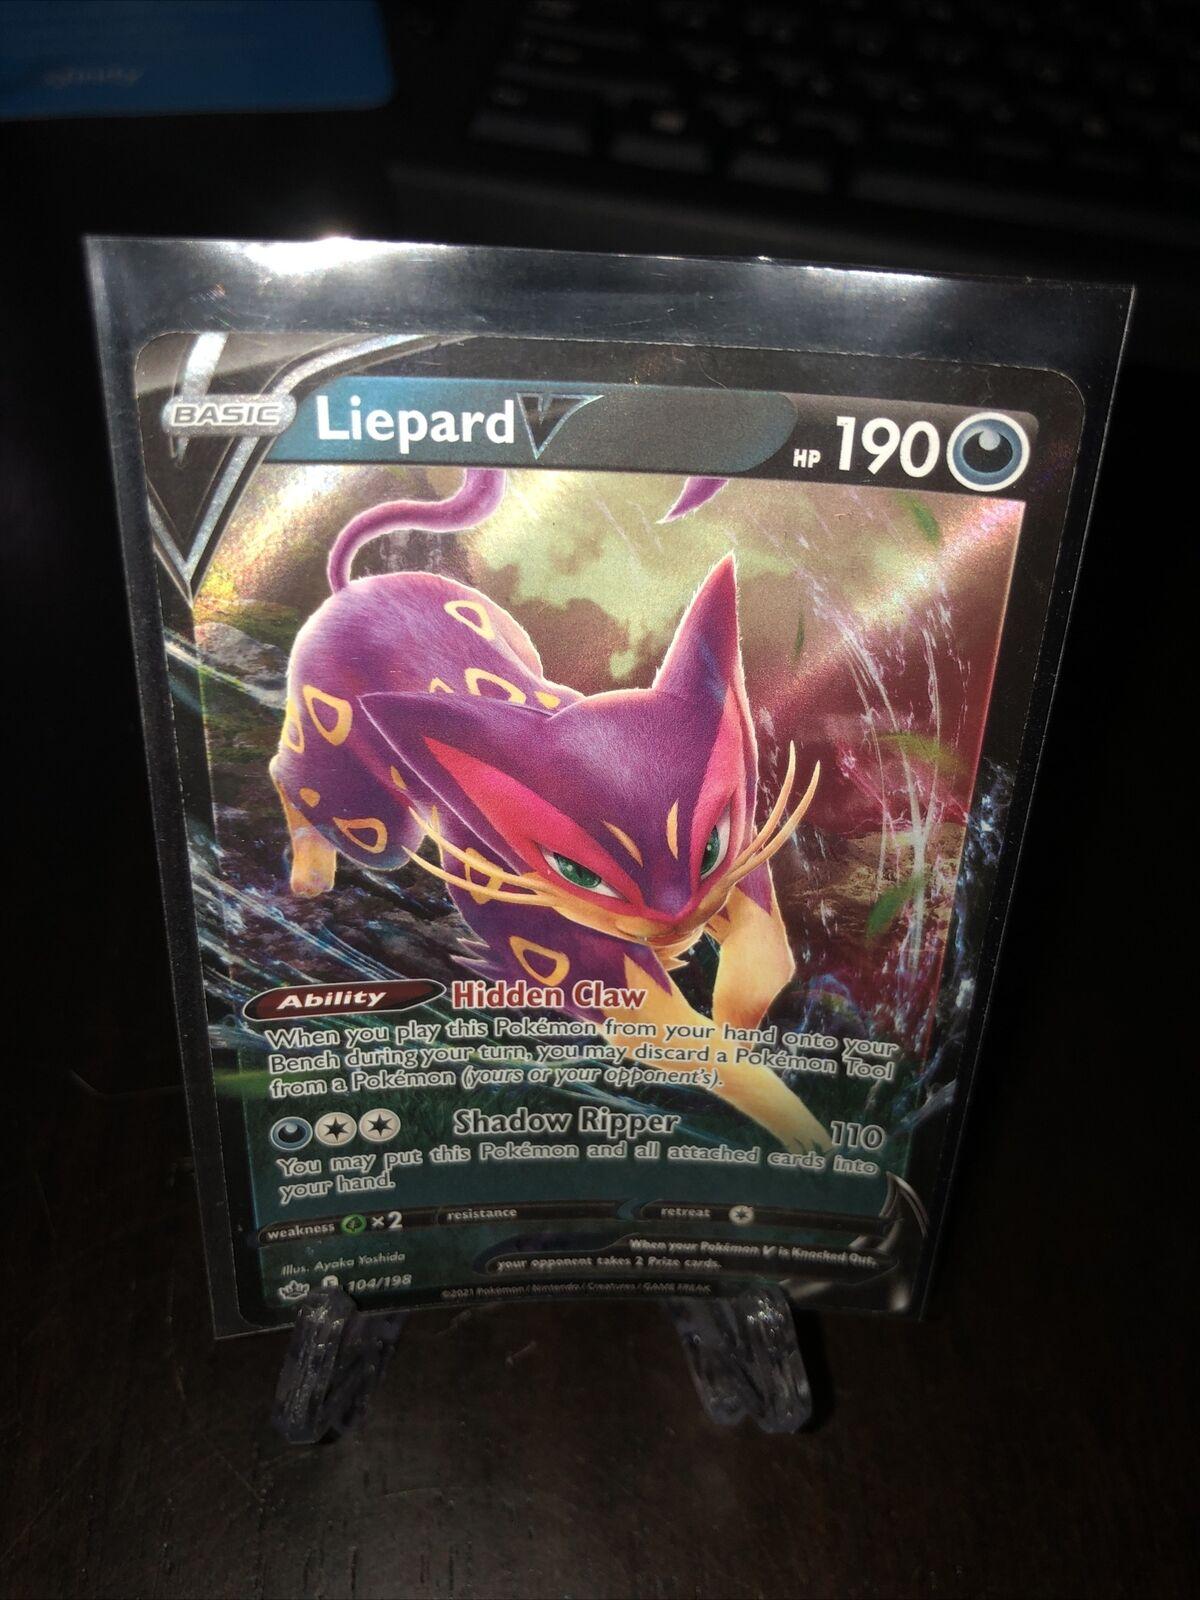 POKEMON TCG CARD Liepard V 104/198 Chilling Reign 2021 Ultra Rare Holofoil - NM